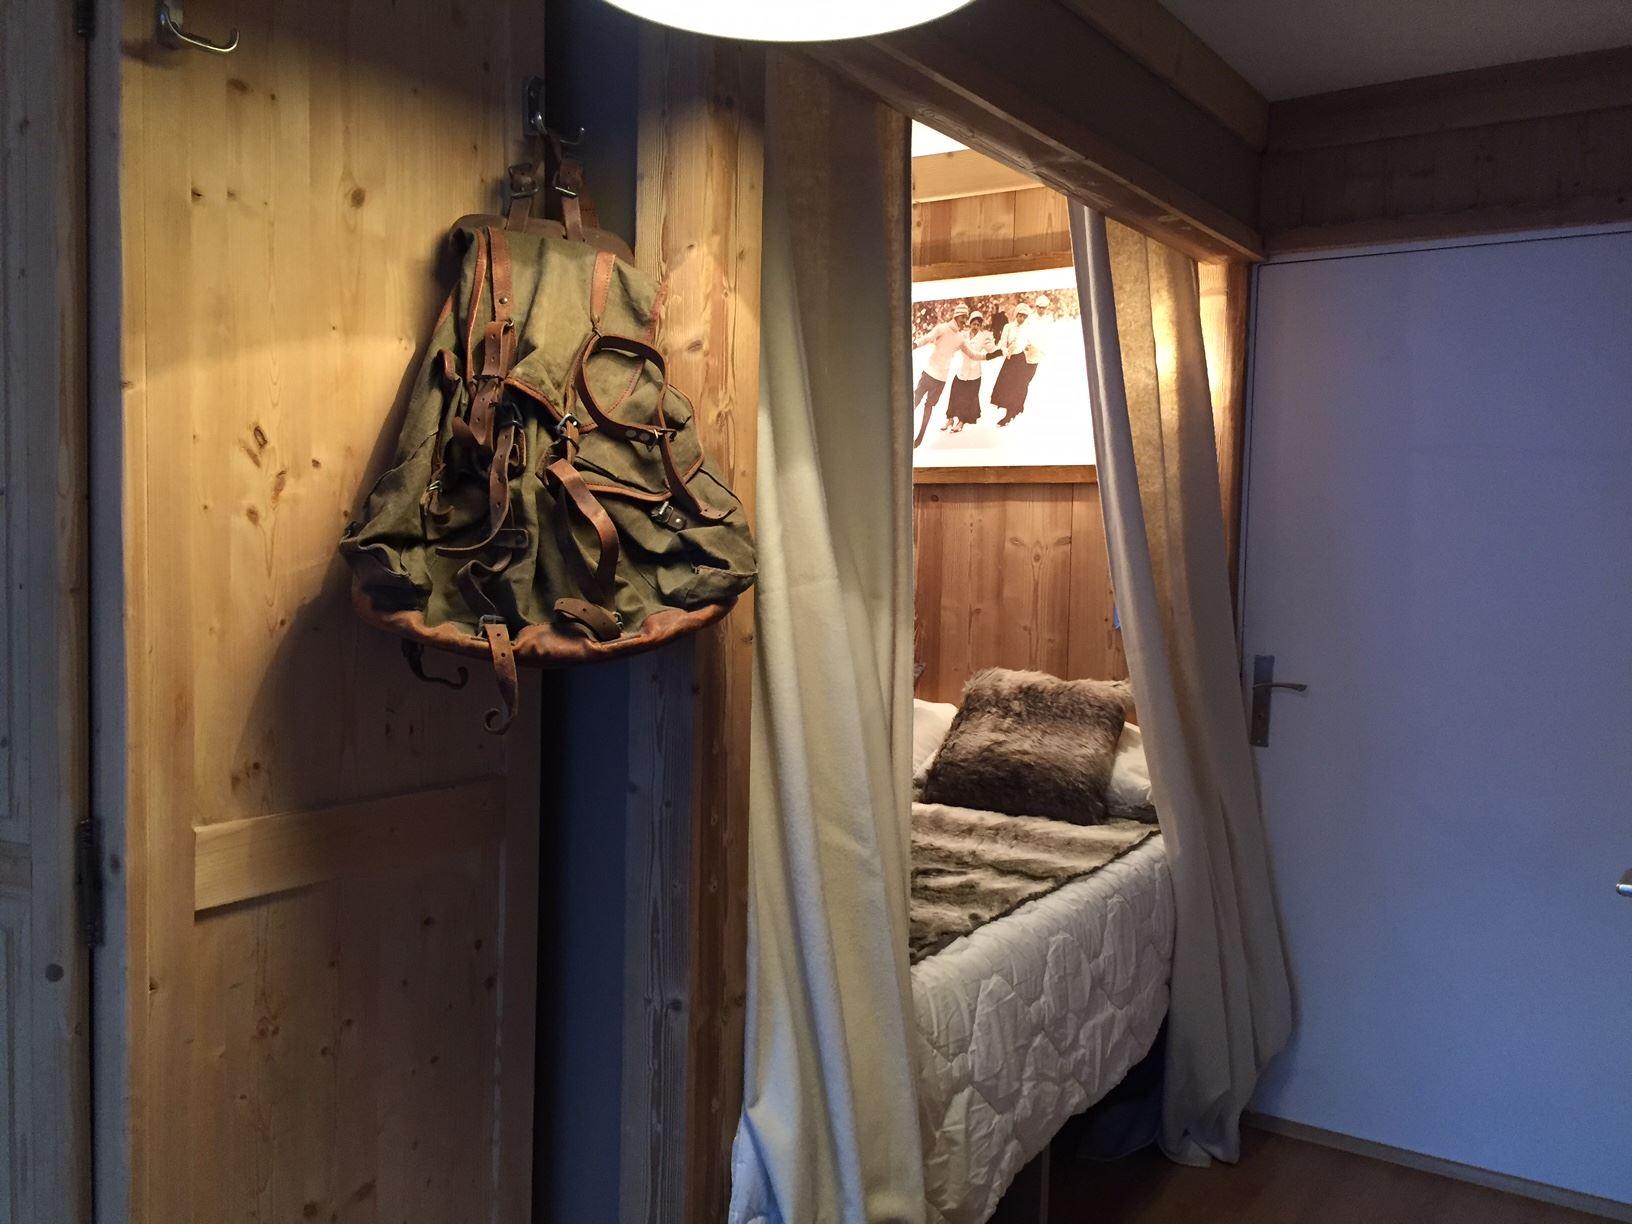 Cimes de Caron 2706 > 2 Rooms - 3 Persons - 2 Silver Snowflakes (Ma Clé Immo)